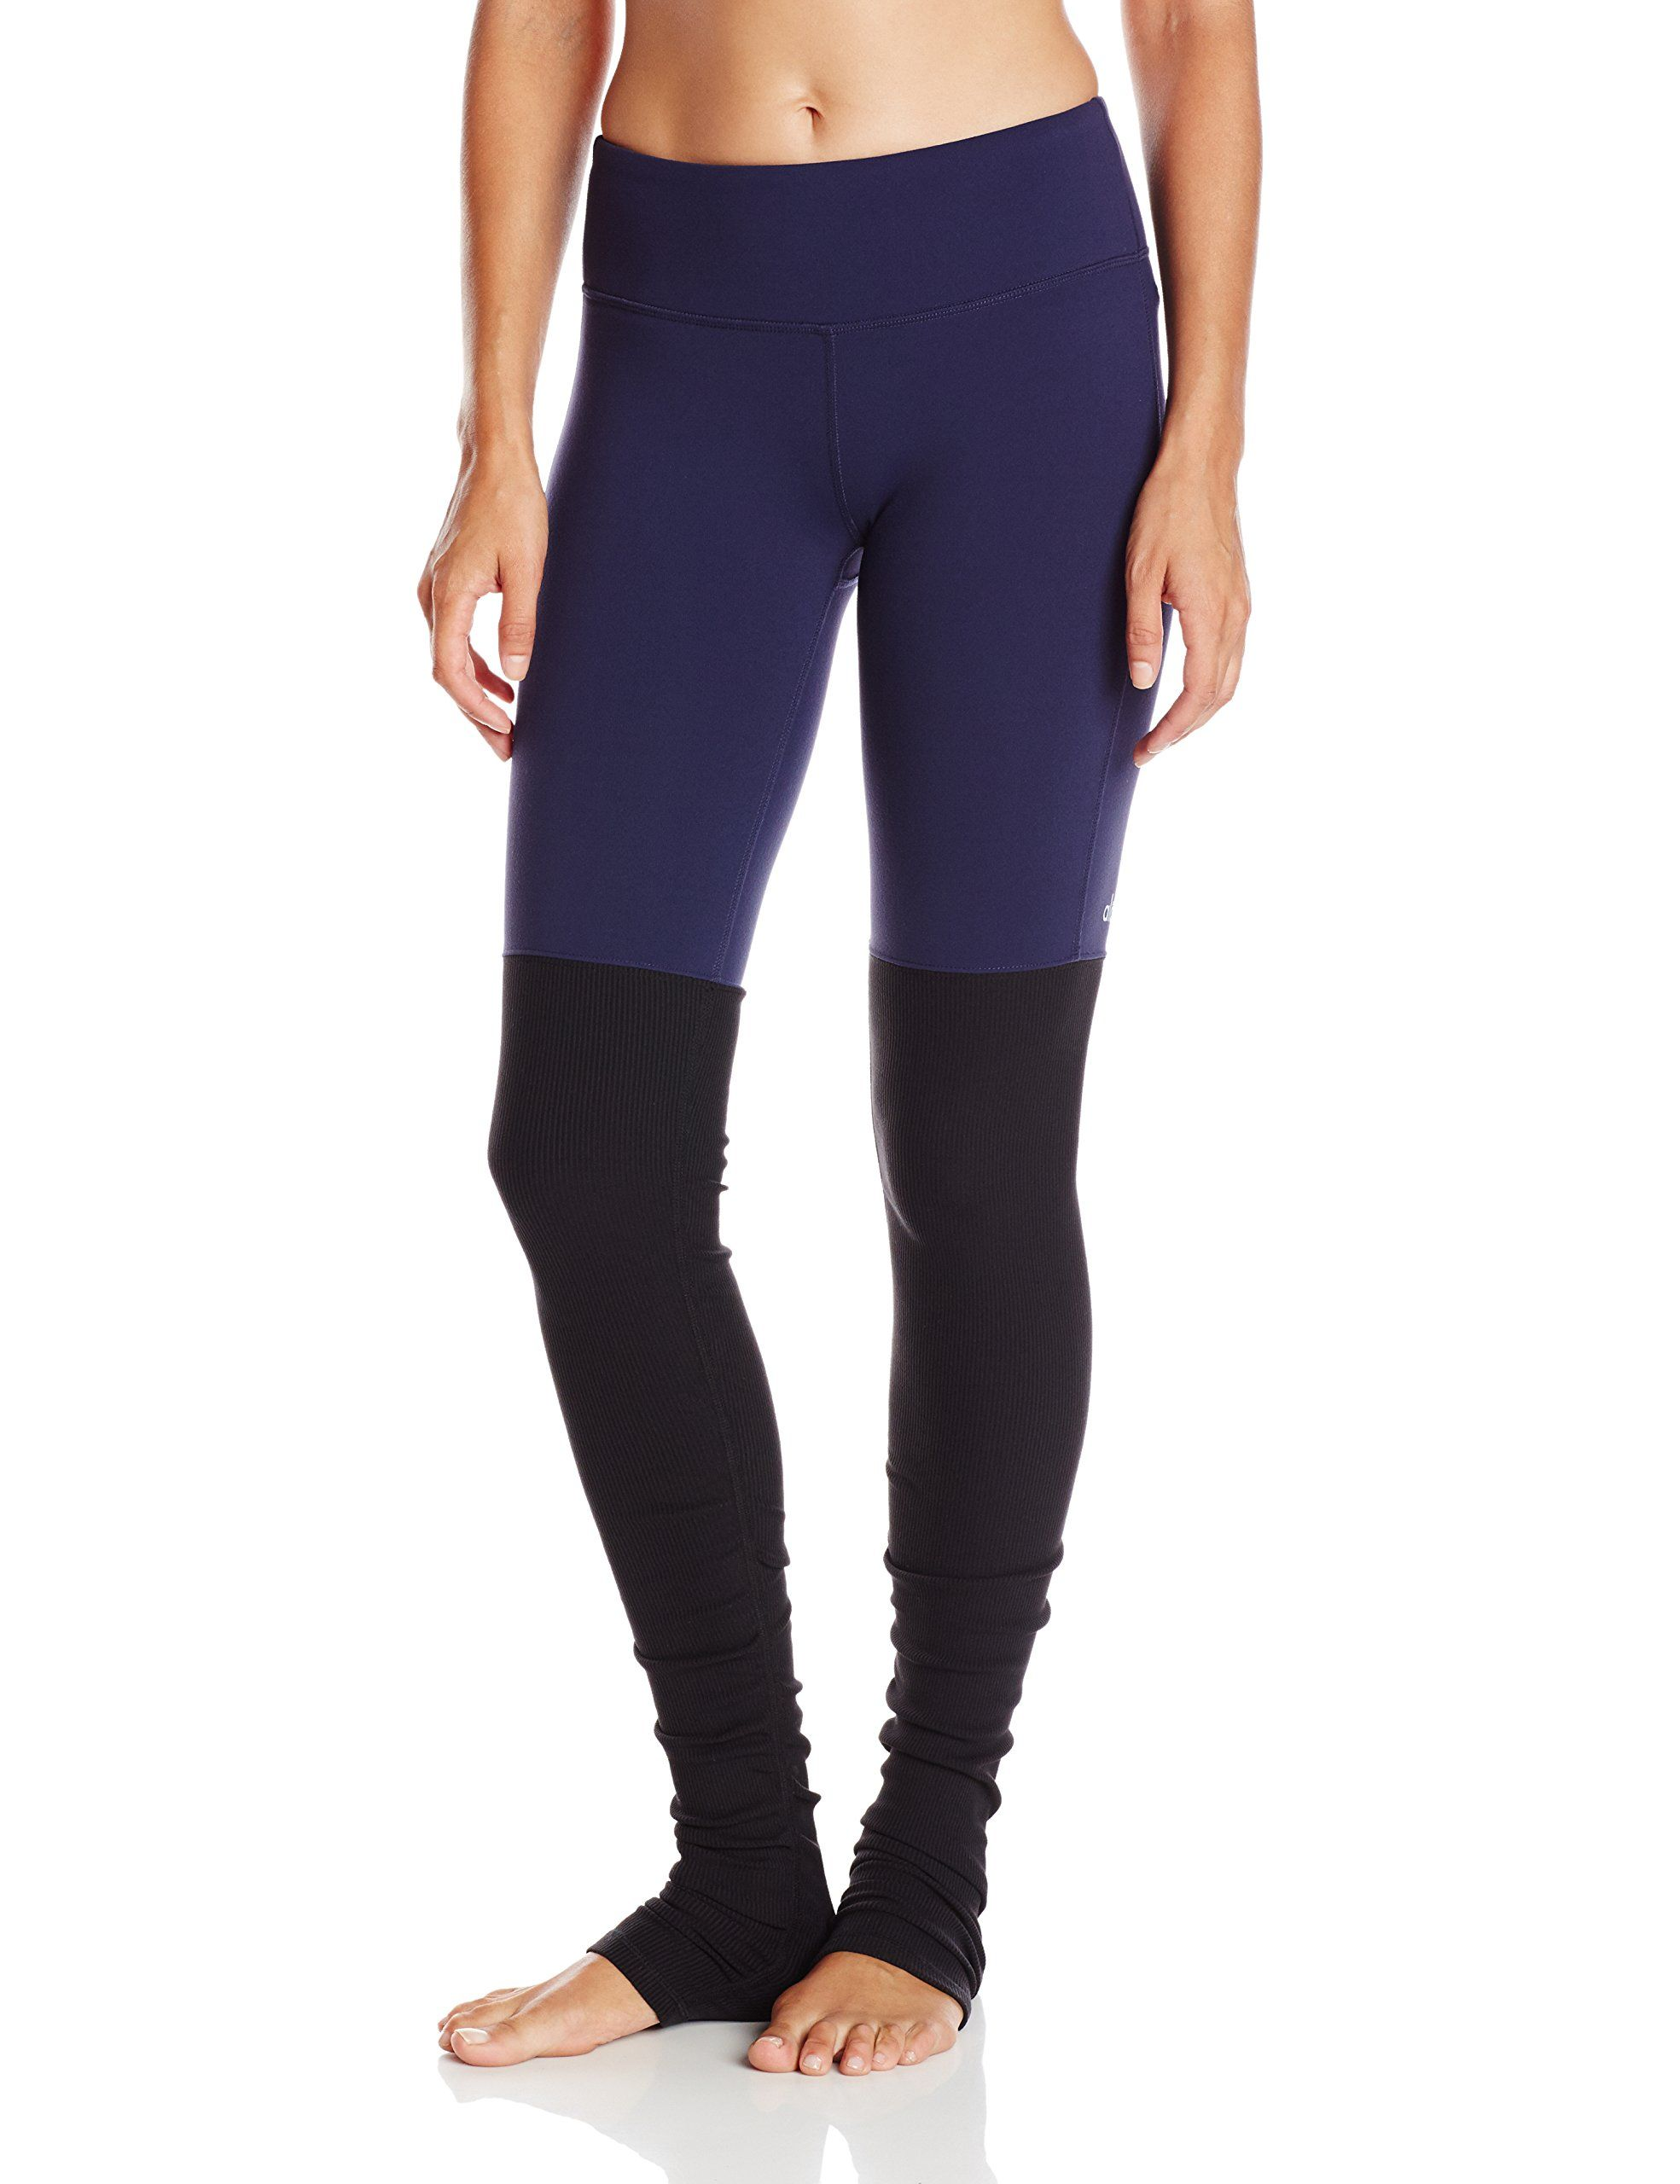 dff87db39c547 Alo Yoga Women's Goddess Ribbed Legging, Rich Navy/Black, Large. Elastic-